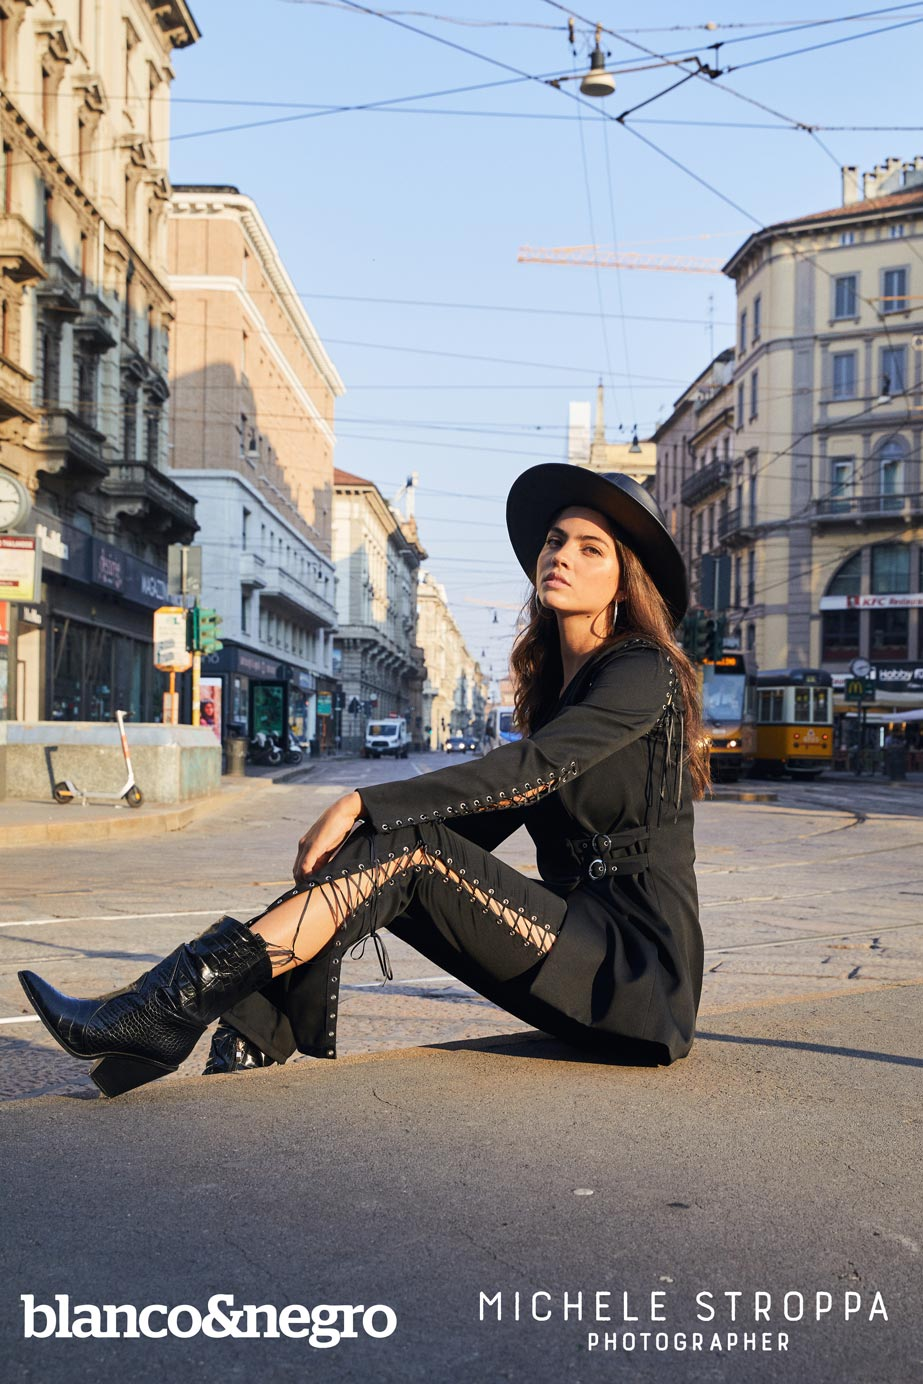 Valeria-Ochoan_Milamor_Valeria-Ochoan_Milamor_JF3A7679